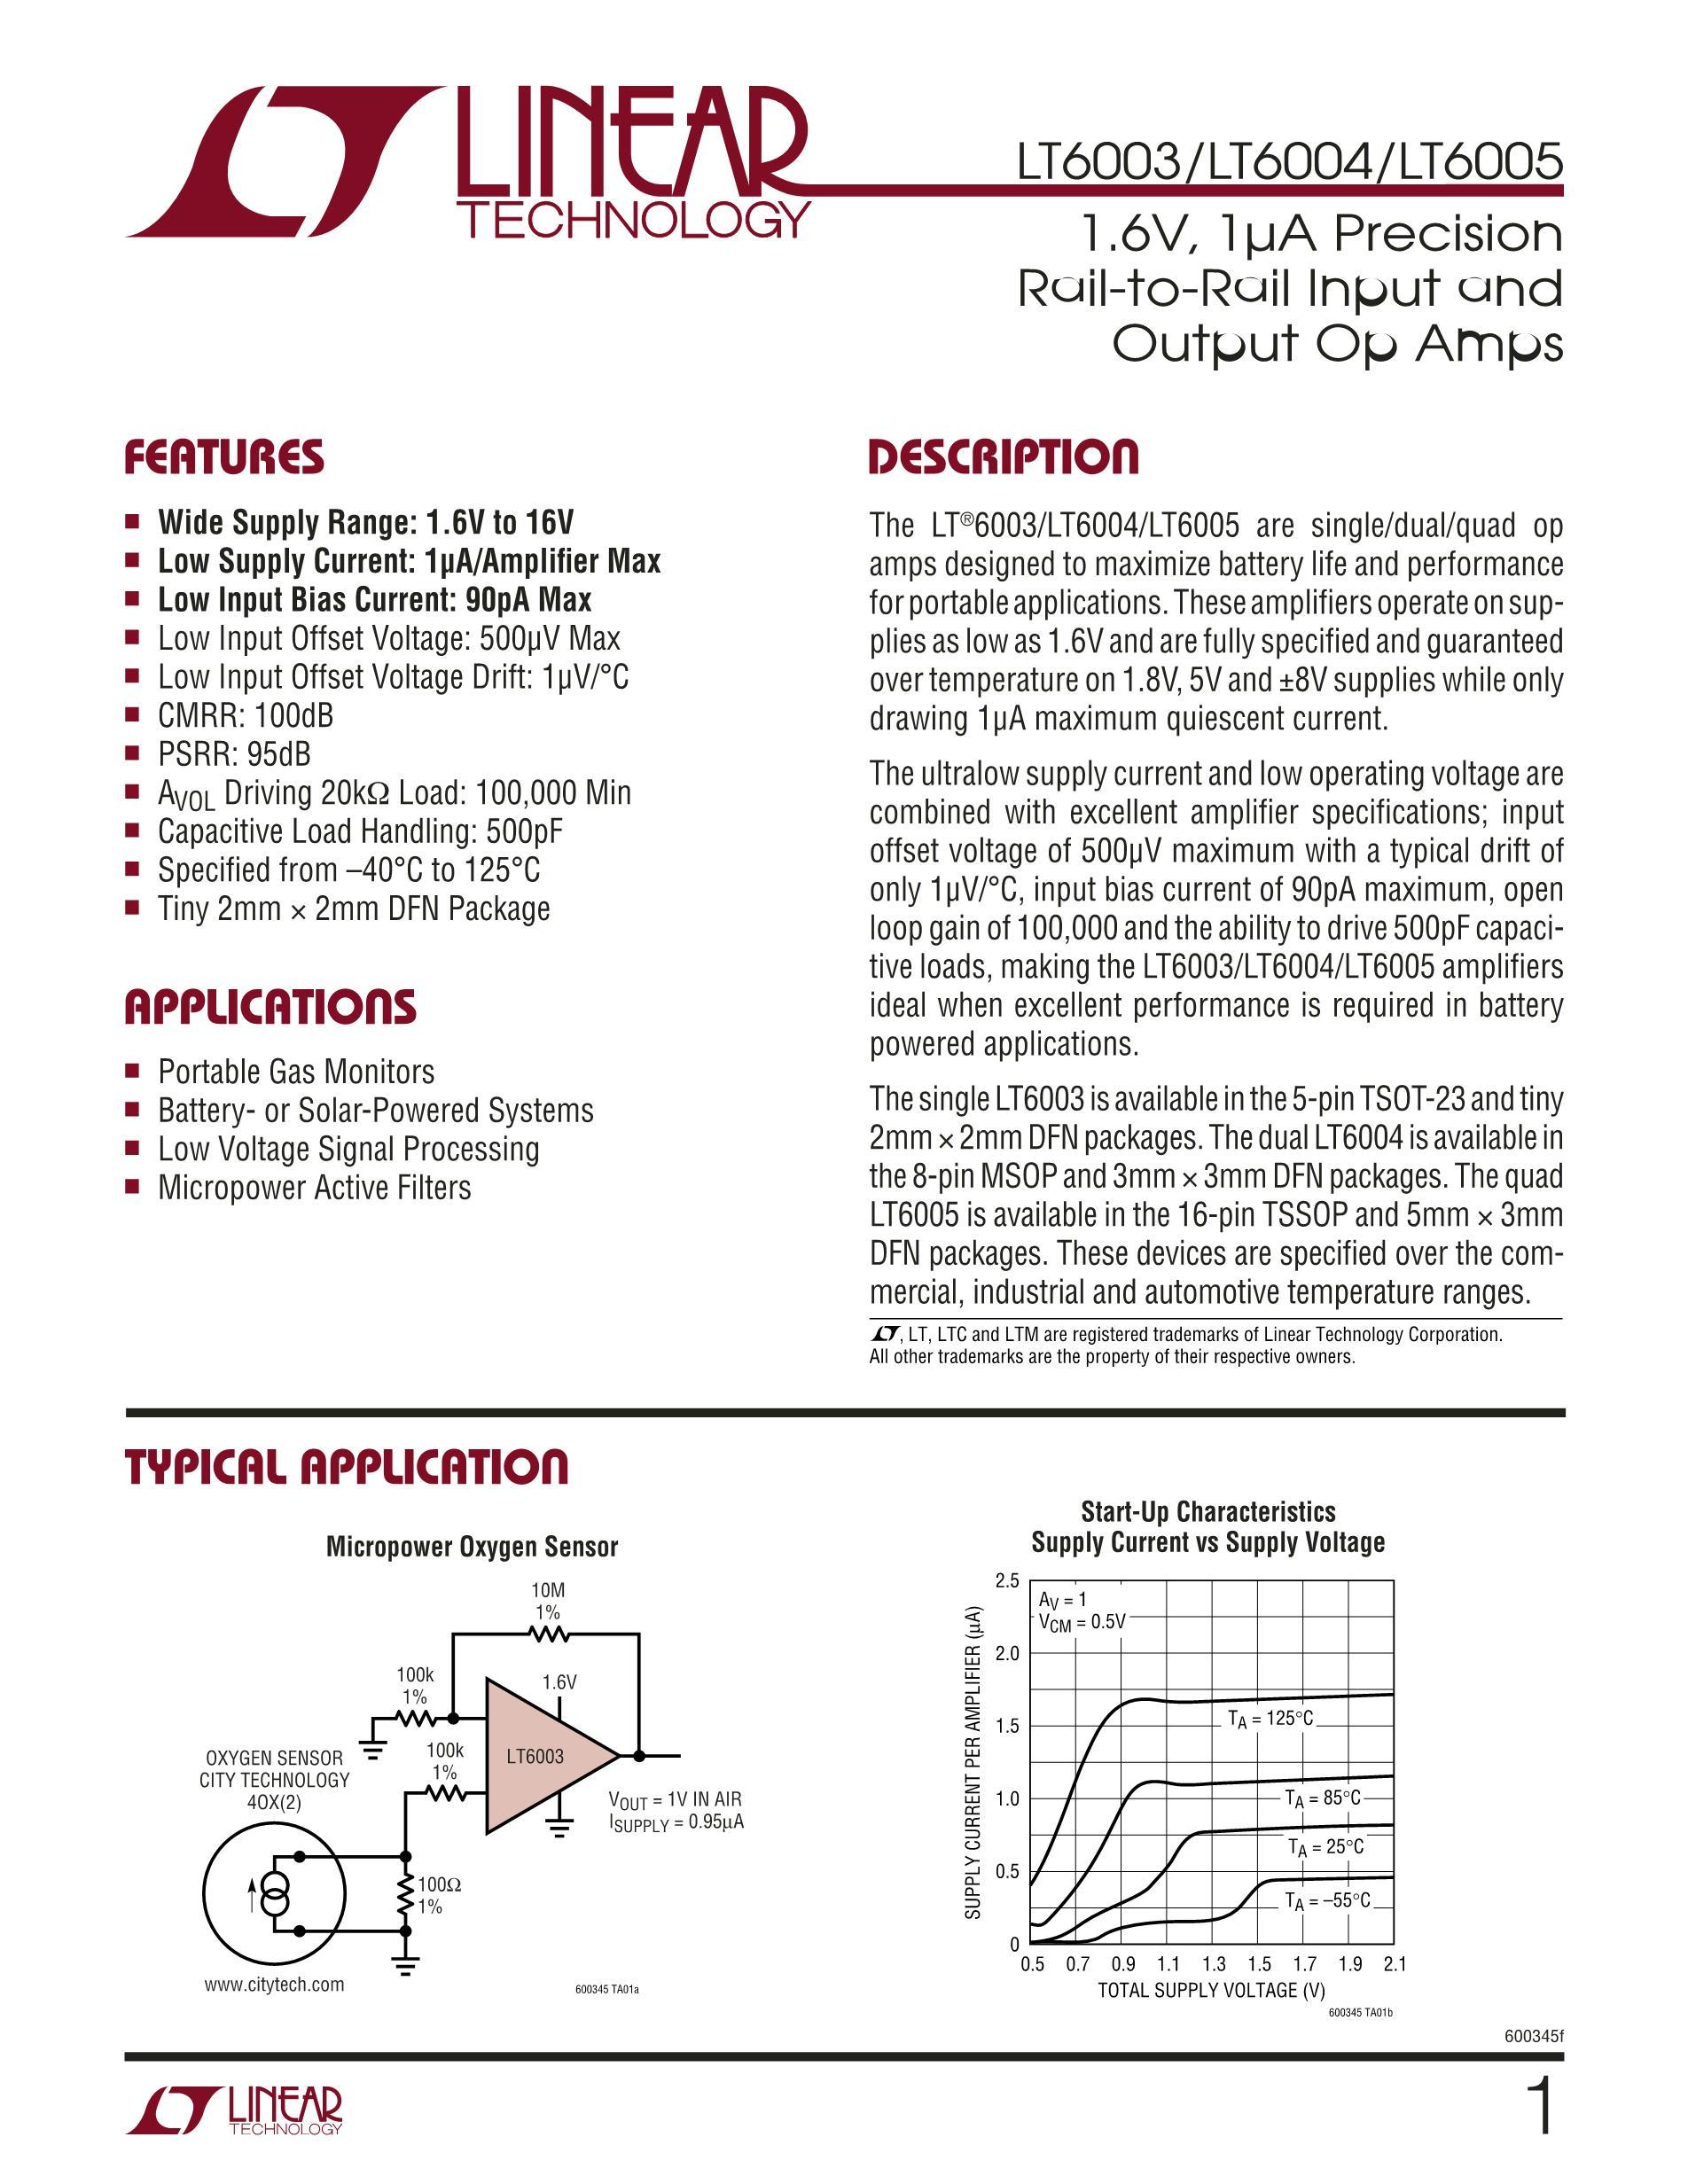 LT6002CDHC's pdf picture 1